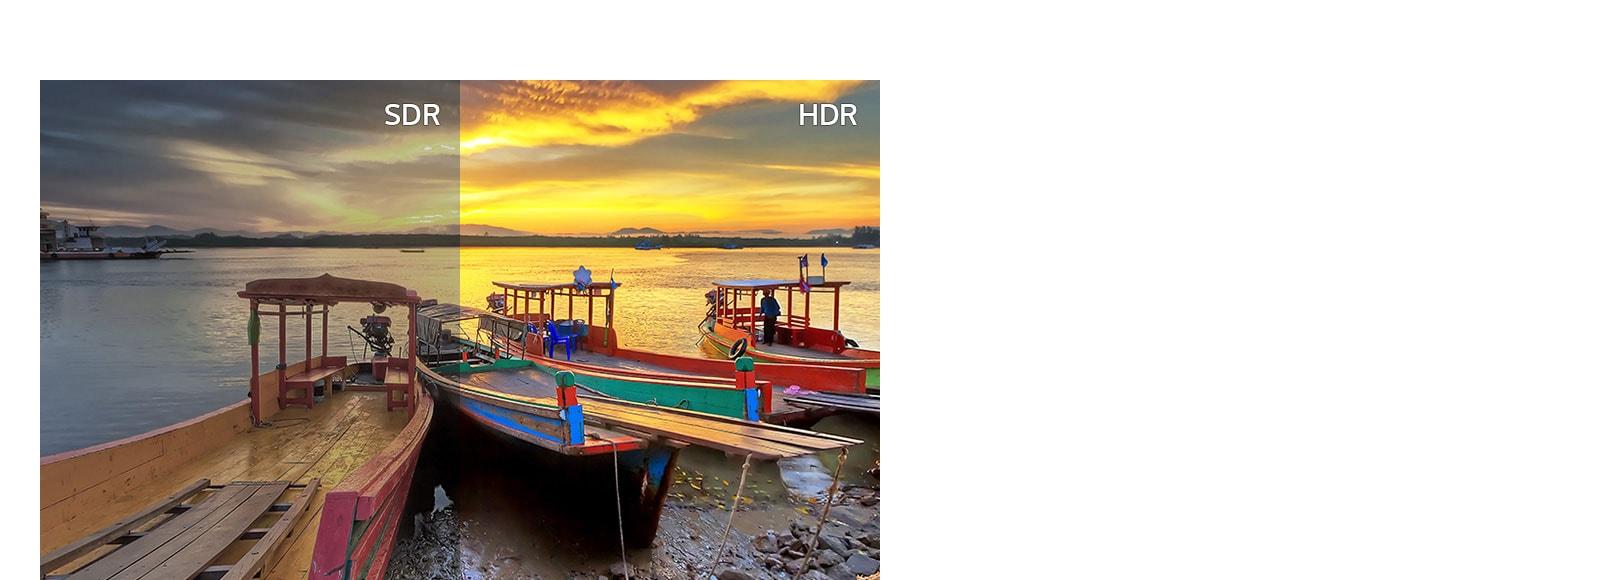 SDR versus HDR 10.